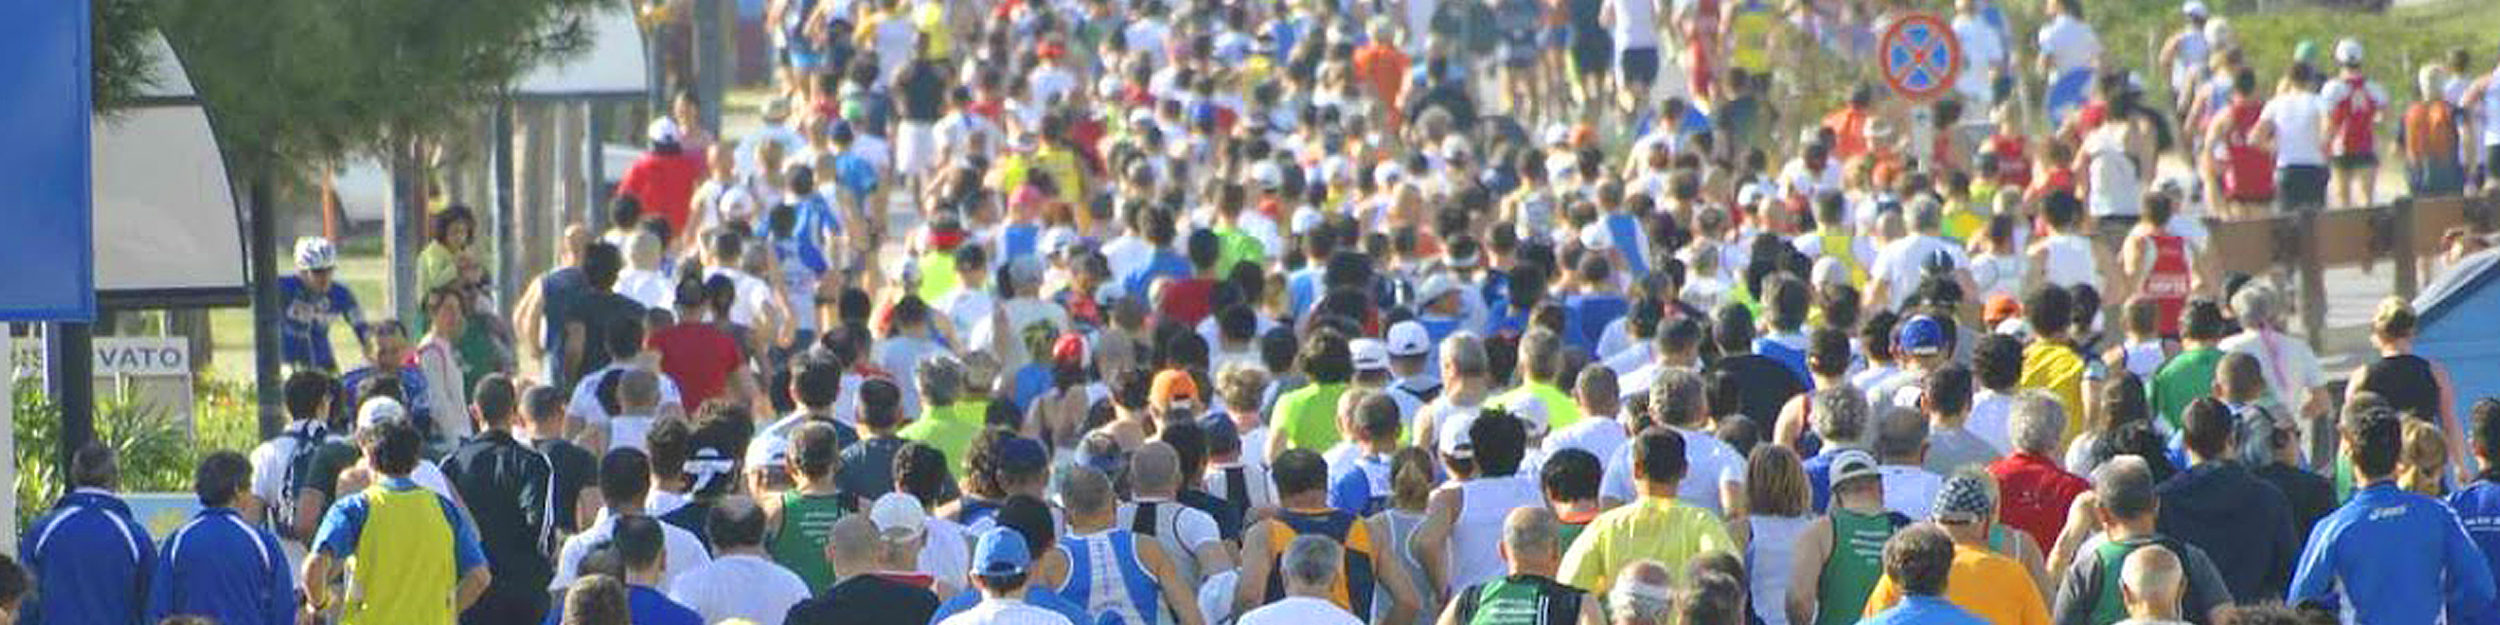 Conero Running ™ | Mezza Maratona – 28.04.19